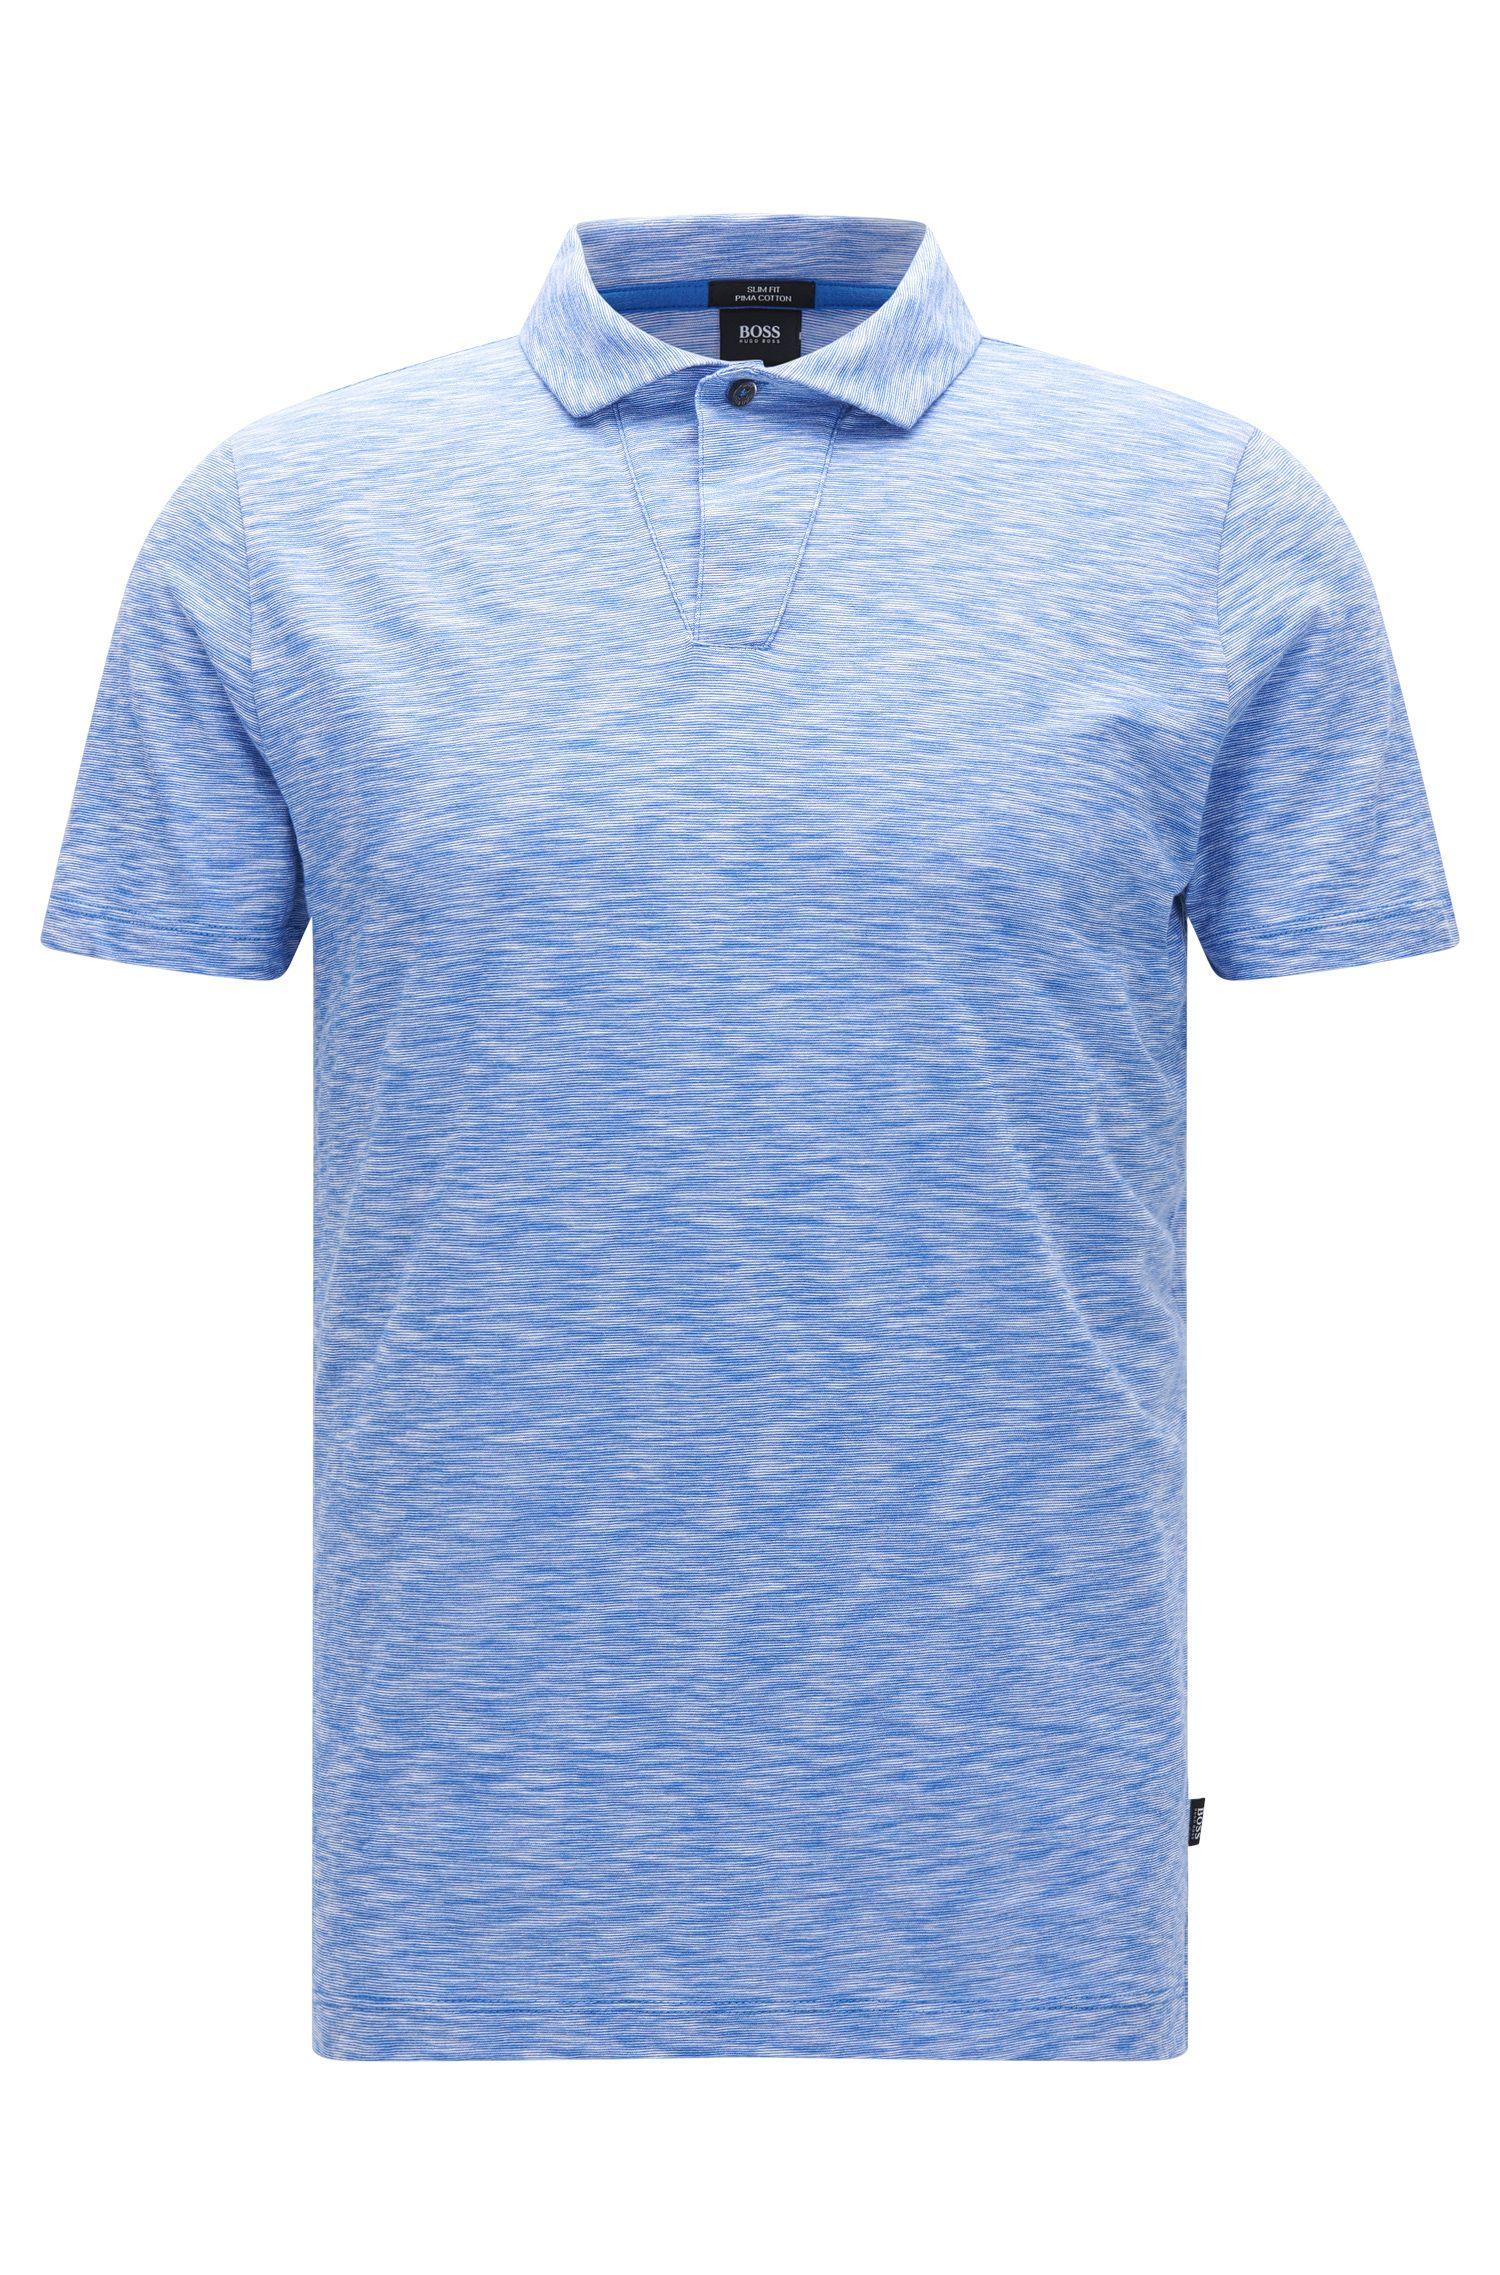 Pima Cotton Jersey Polo Shirt, Slim Fit   Plato